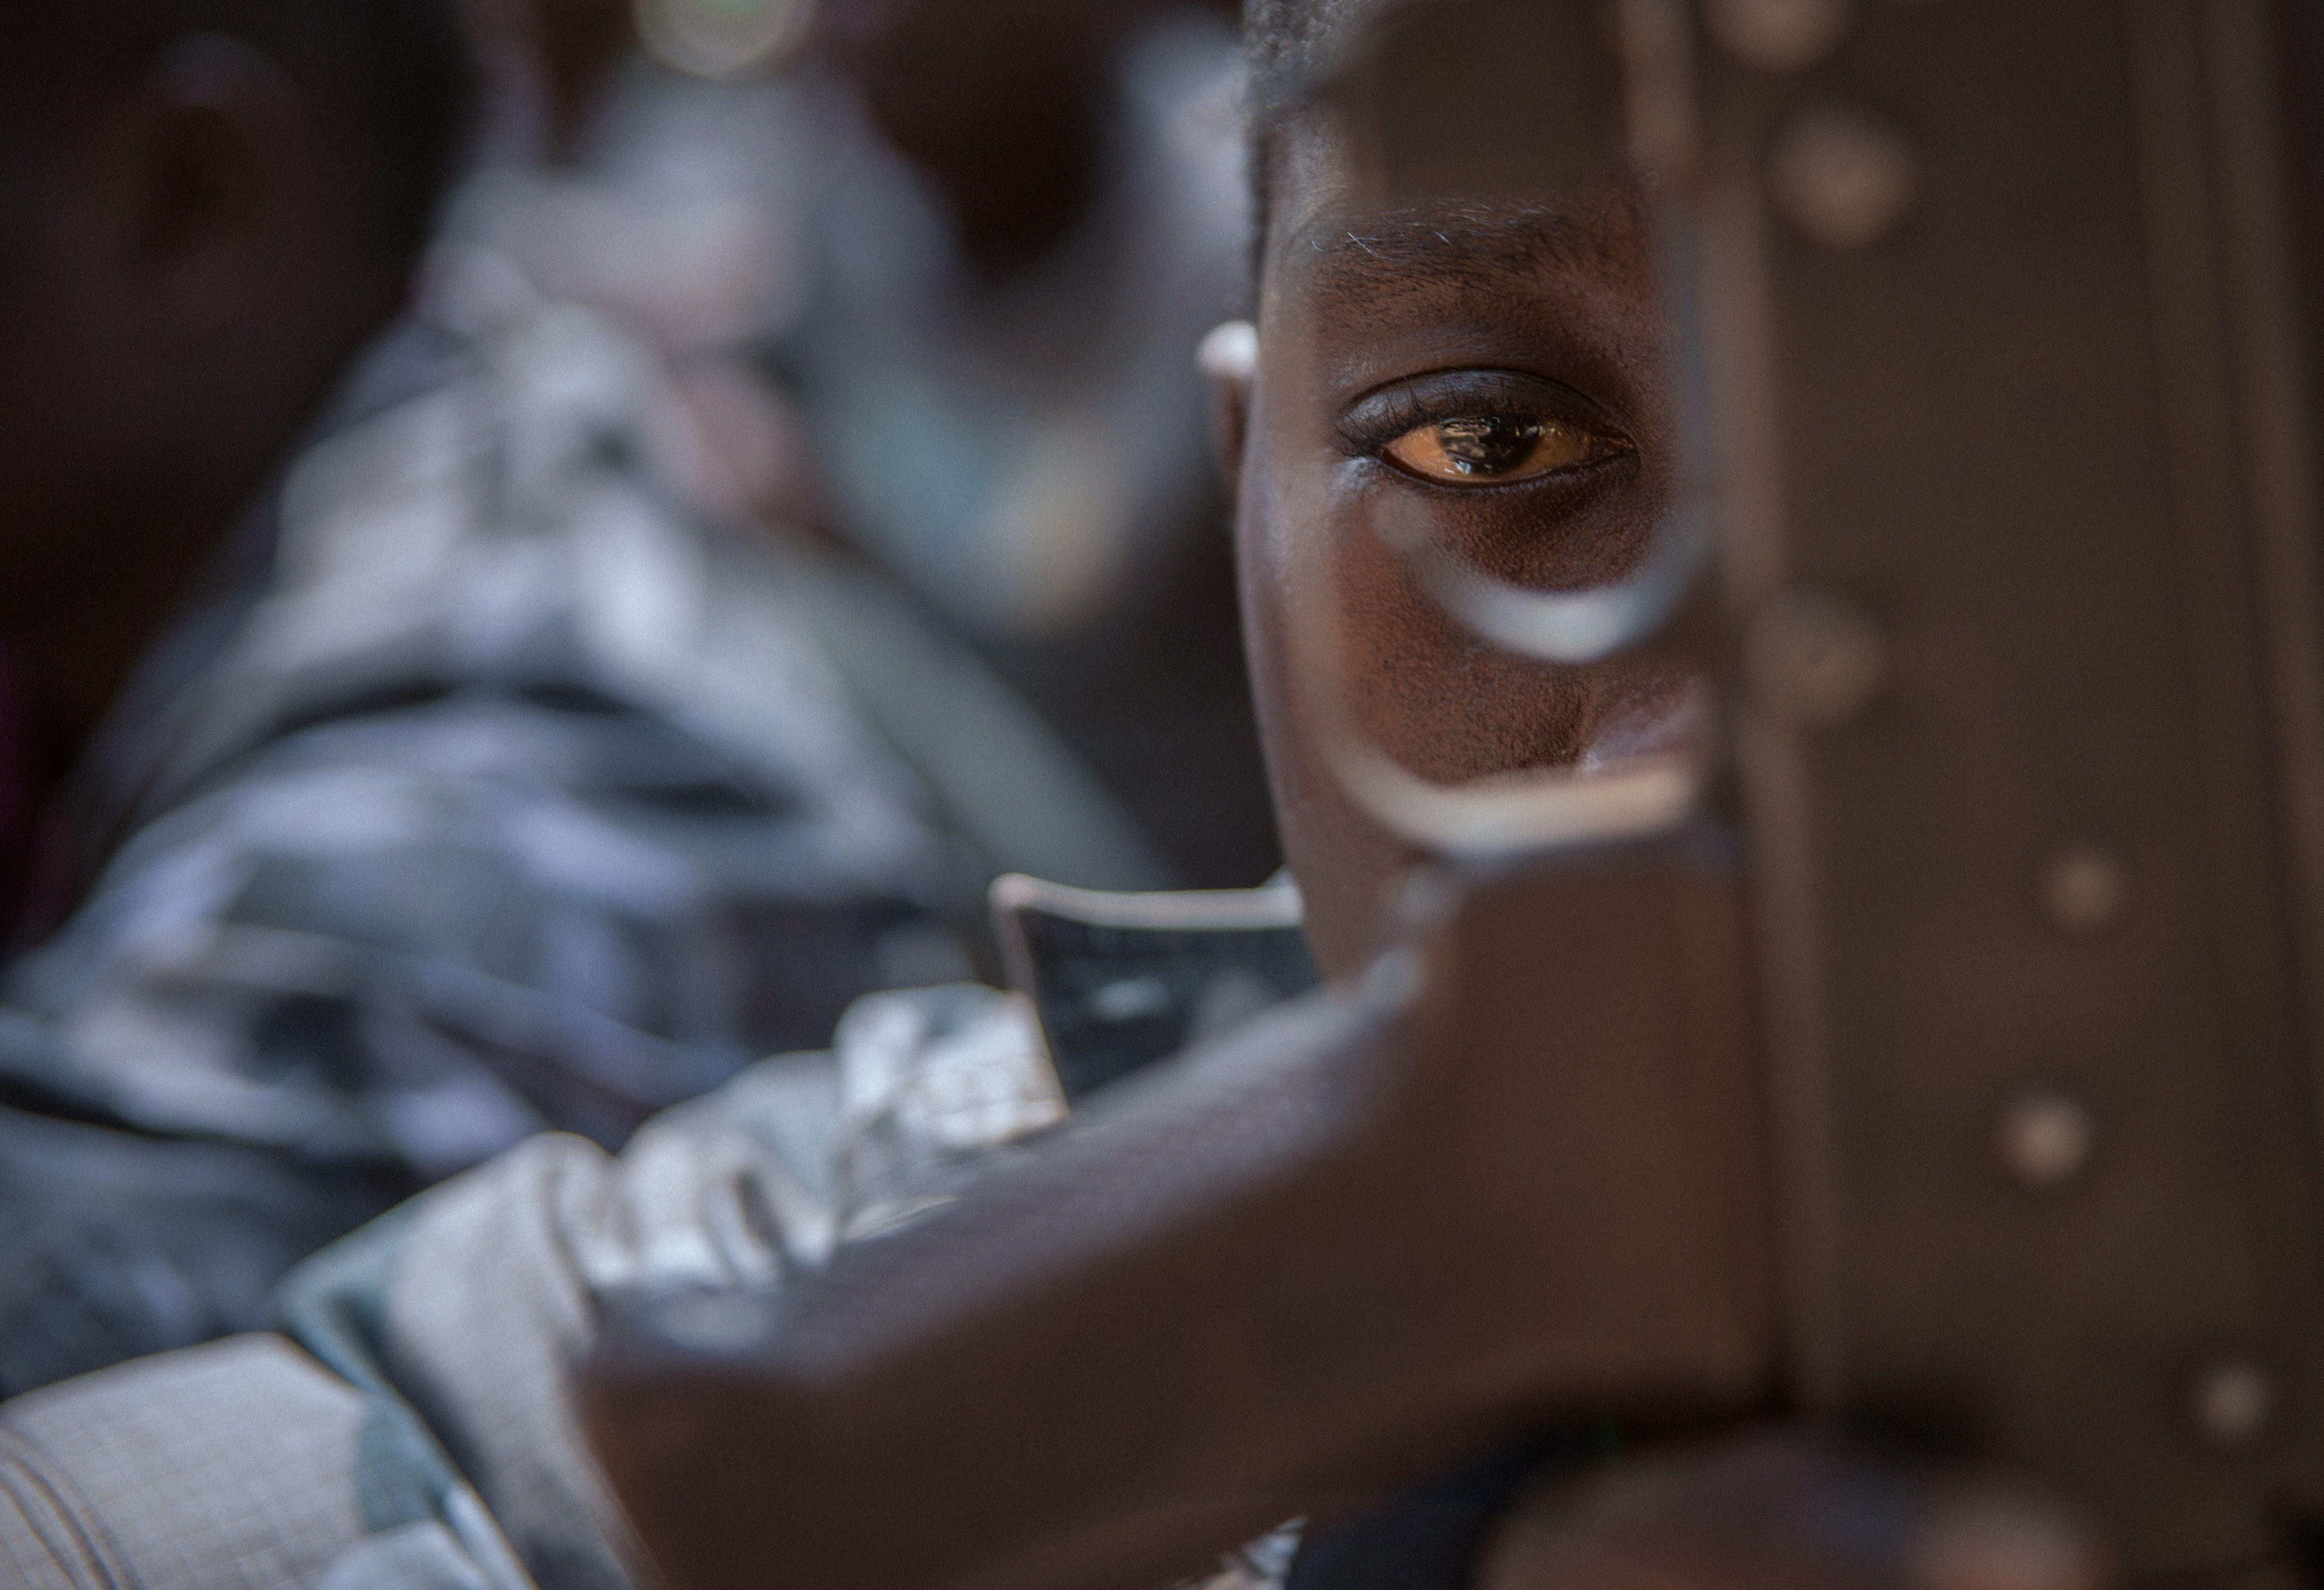 A child looks through a rifle trigger guard.